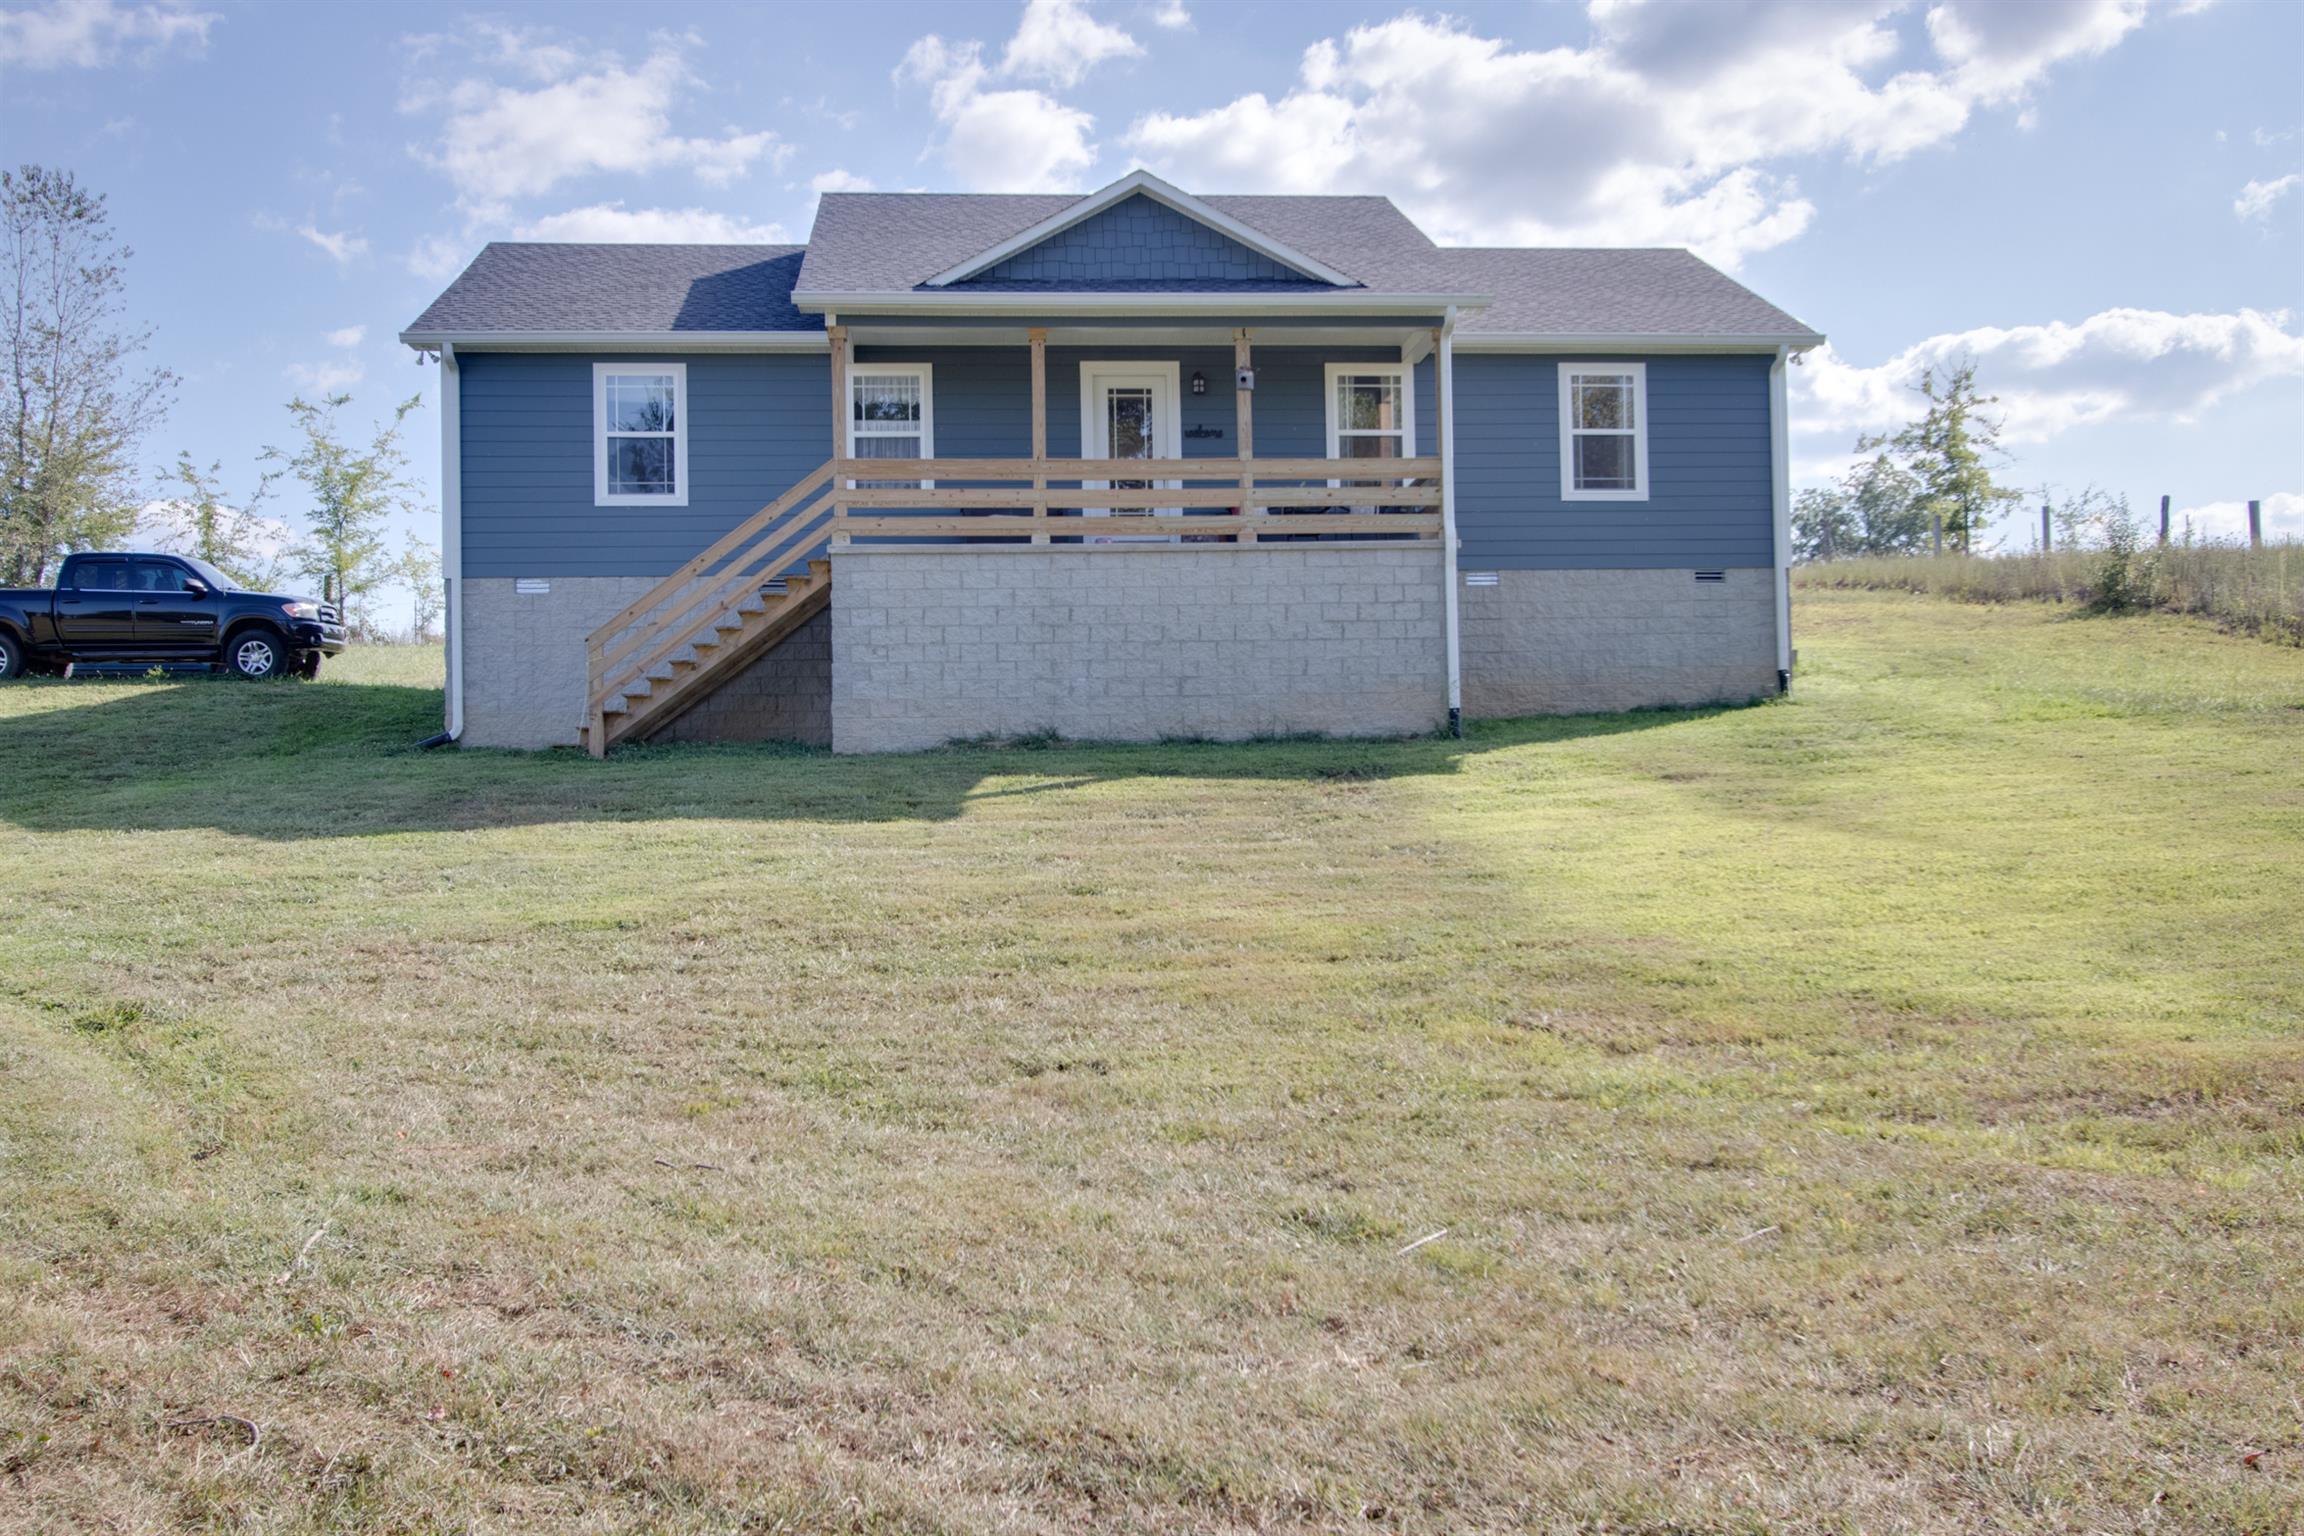 530 Lower Helton Rd, Alexandria, TN 37012 - Alexandria, TN real estate listing